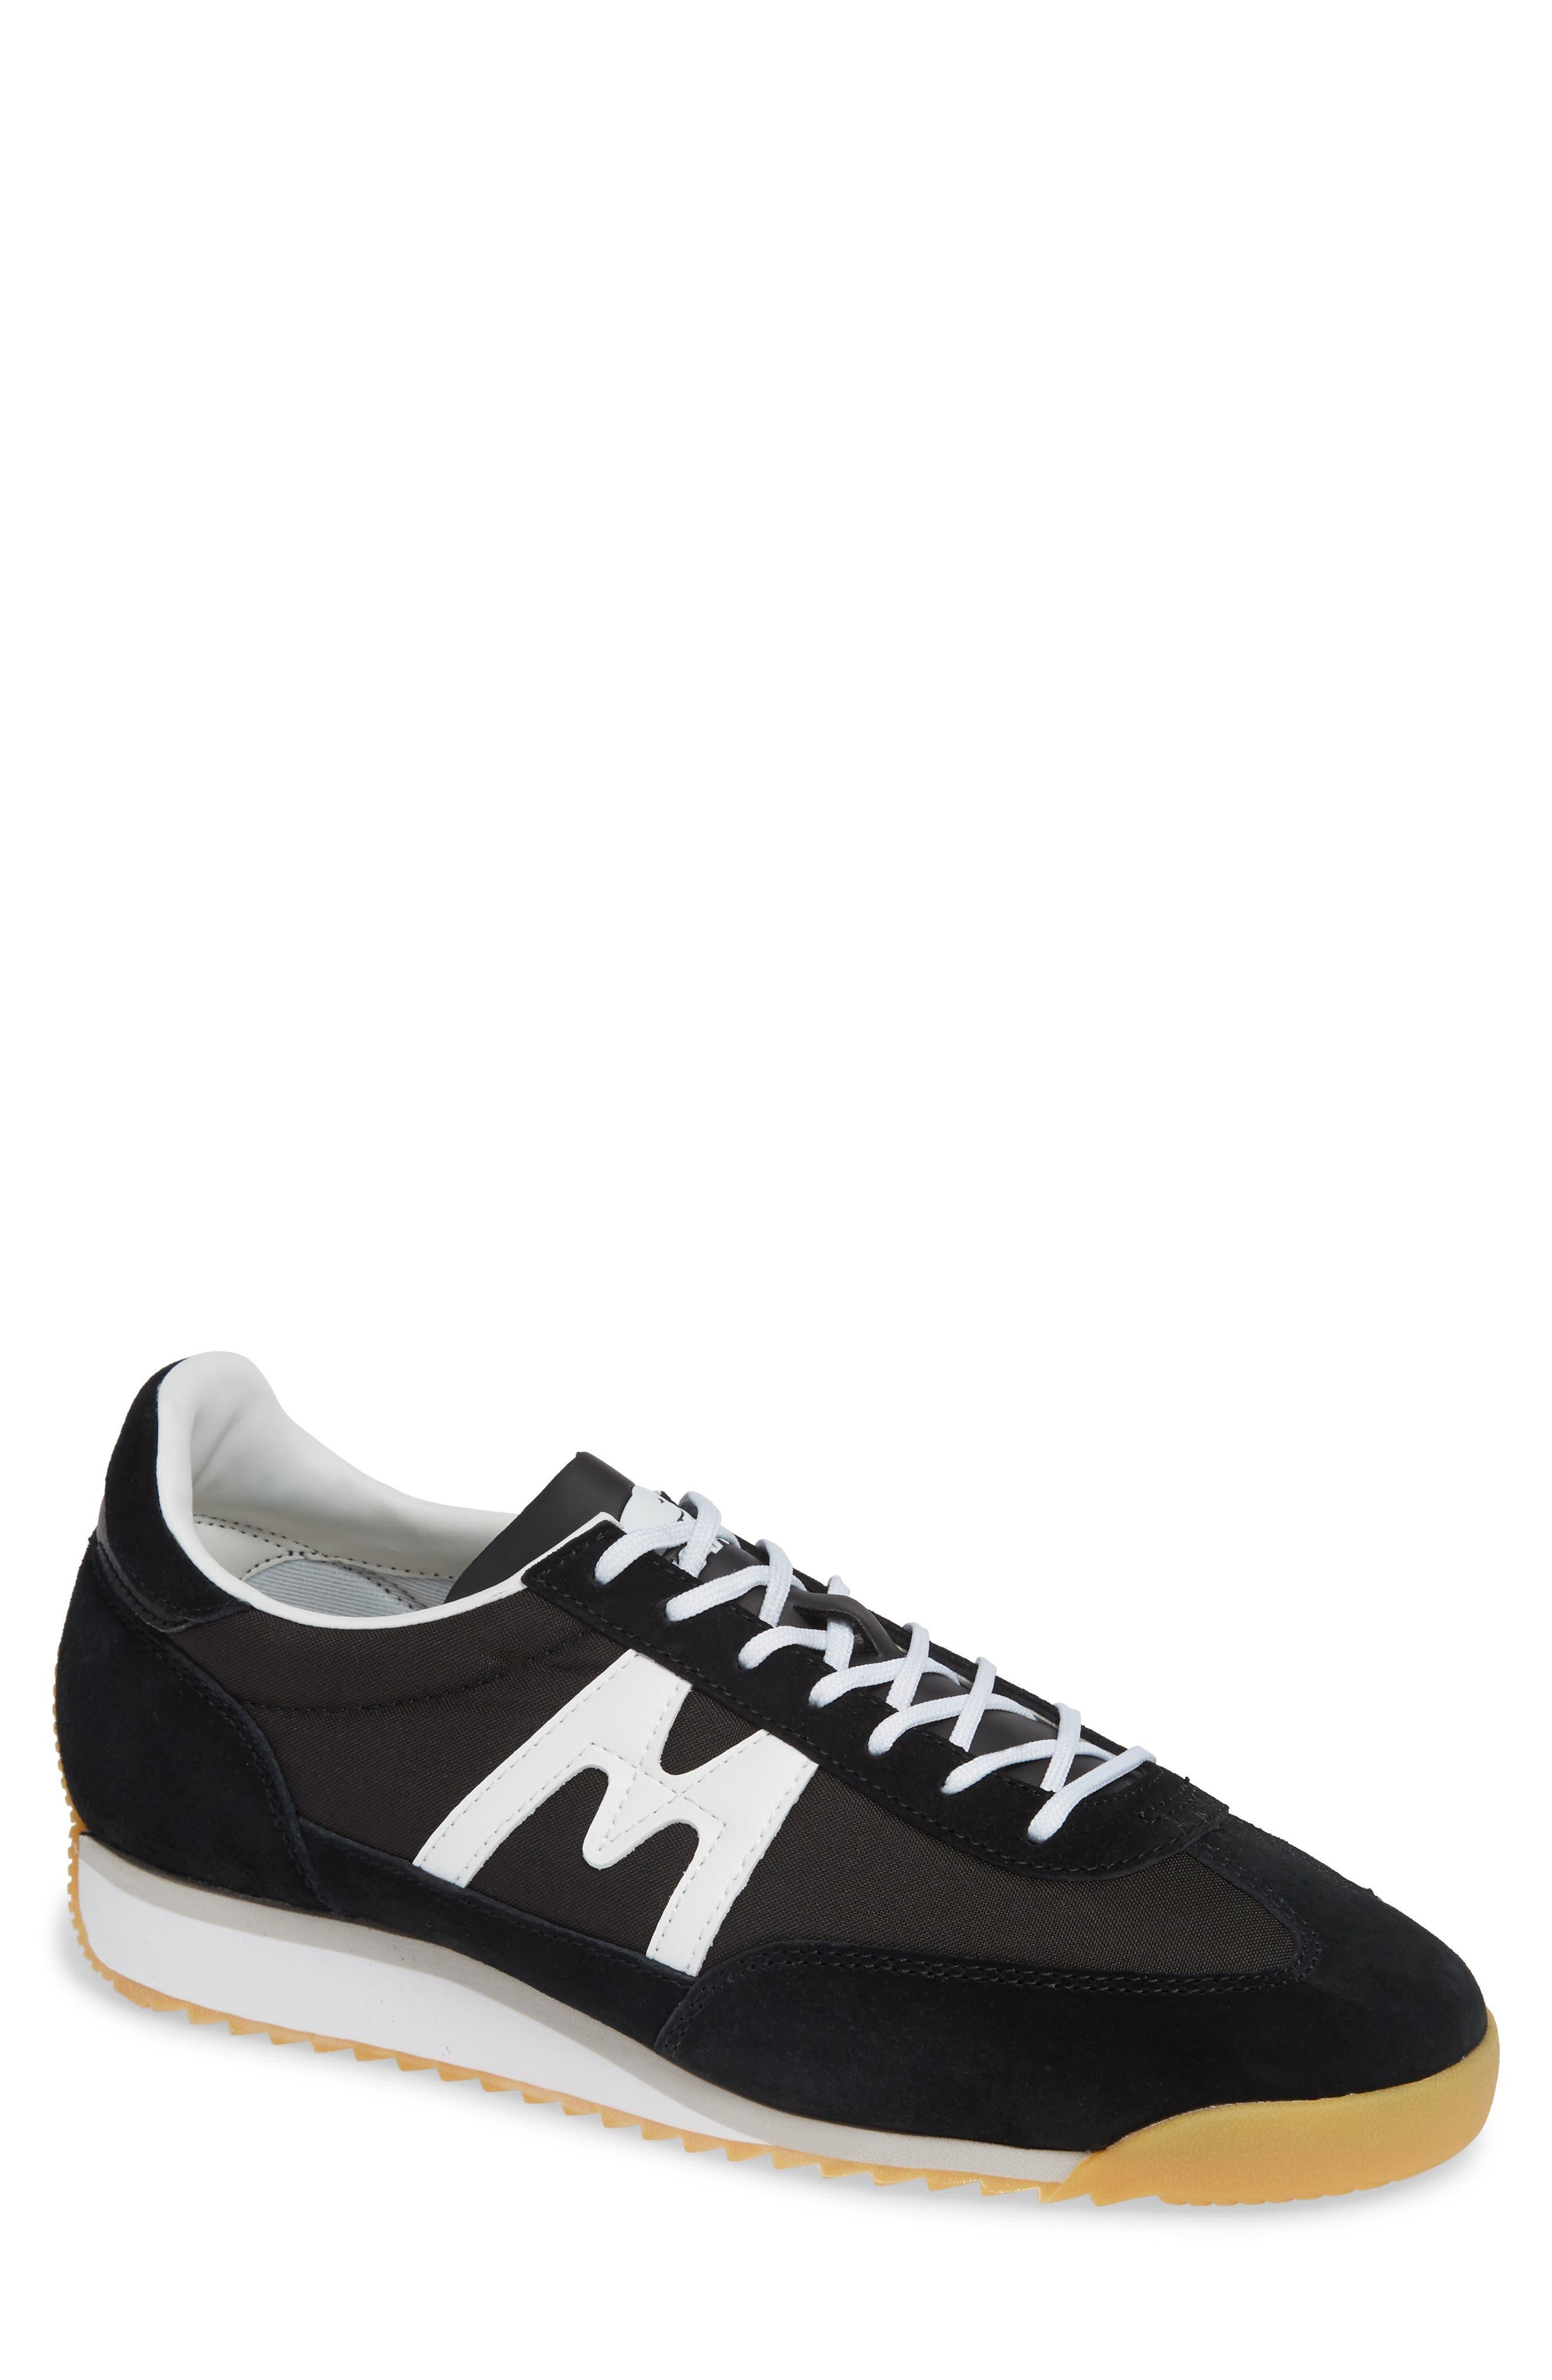 Championair Sneaker,                             Main thumbnail 1, color,                             BLACK/ WHITE